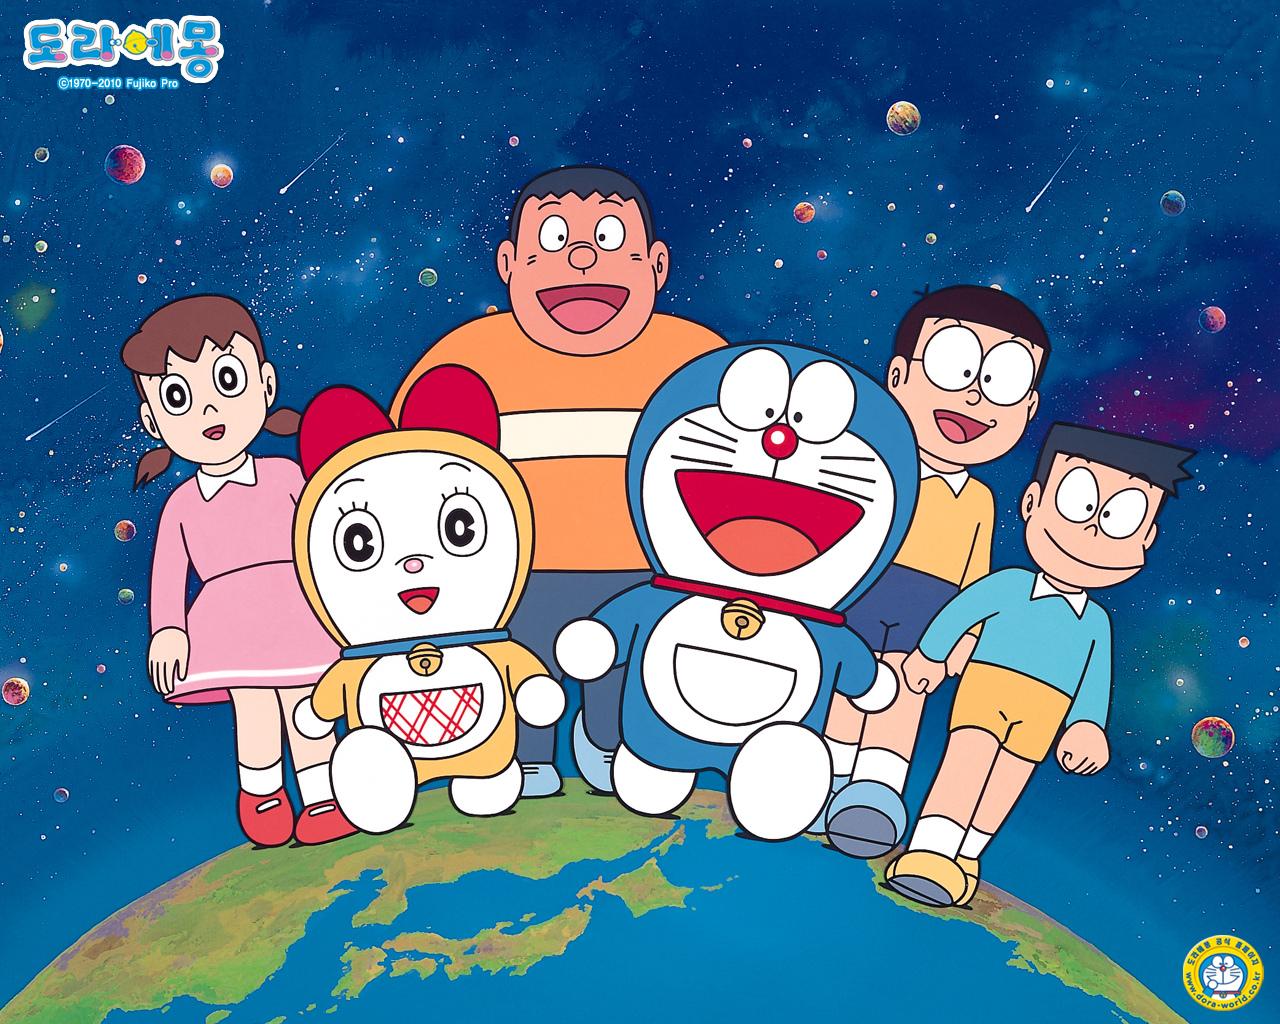 Wallpaper Dragon Ball 3d Hd Fondos De Pantalla De Doraemon Wallpapers Hd Gratis